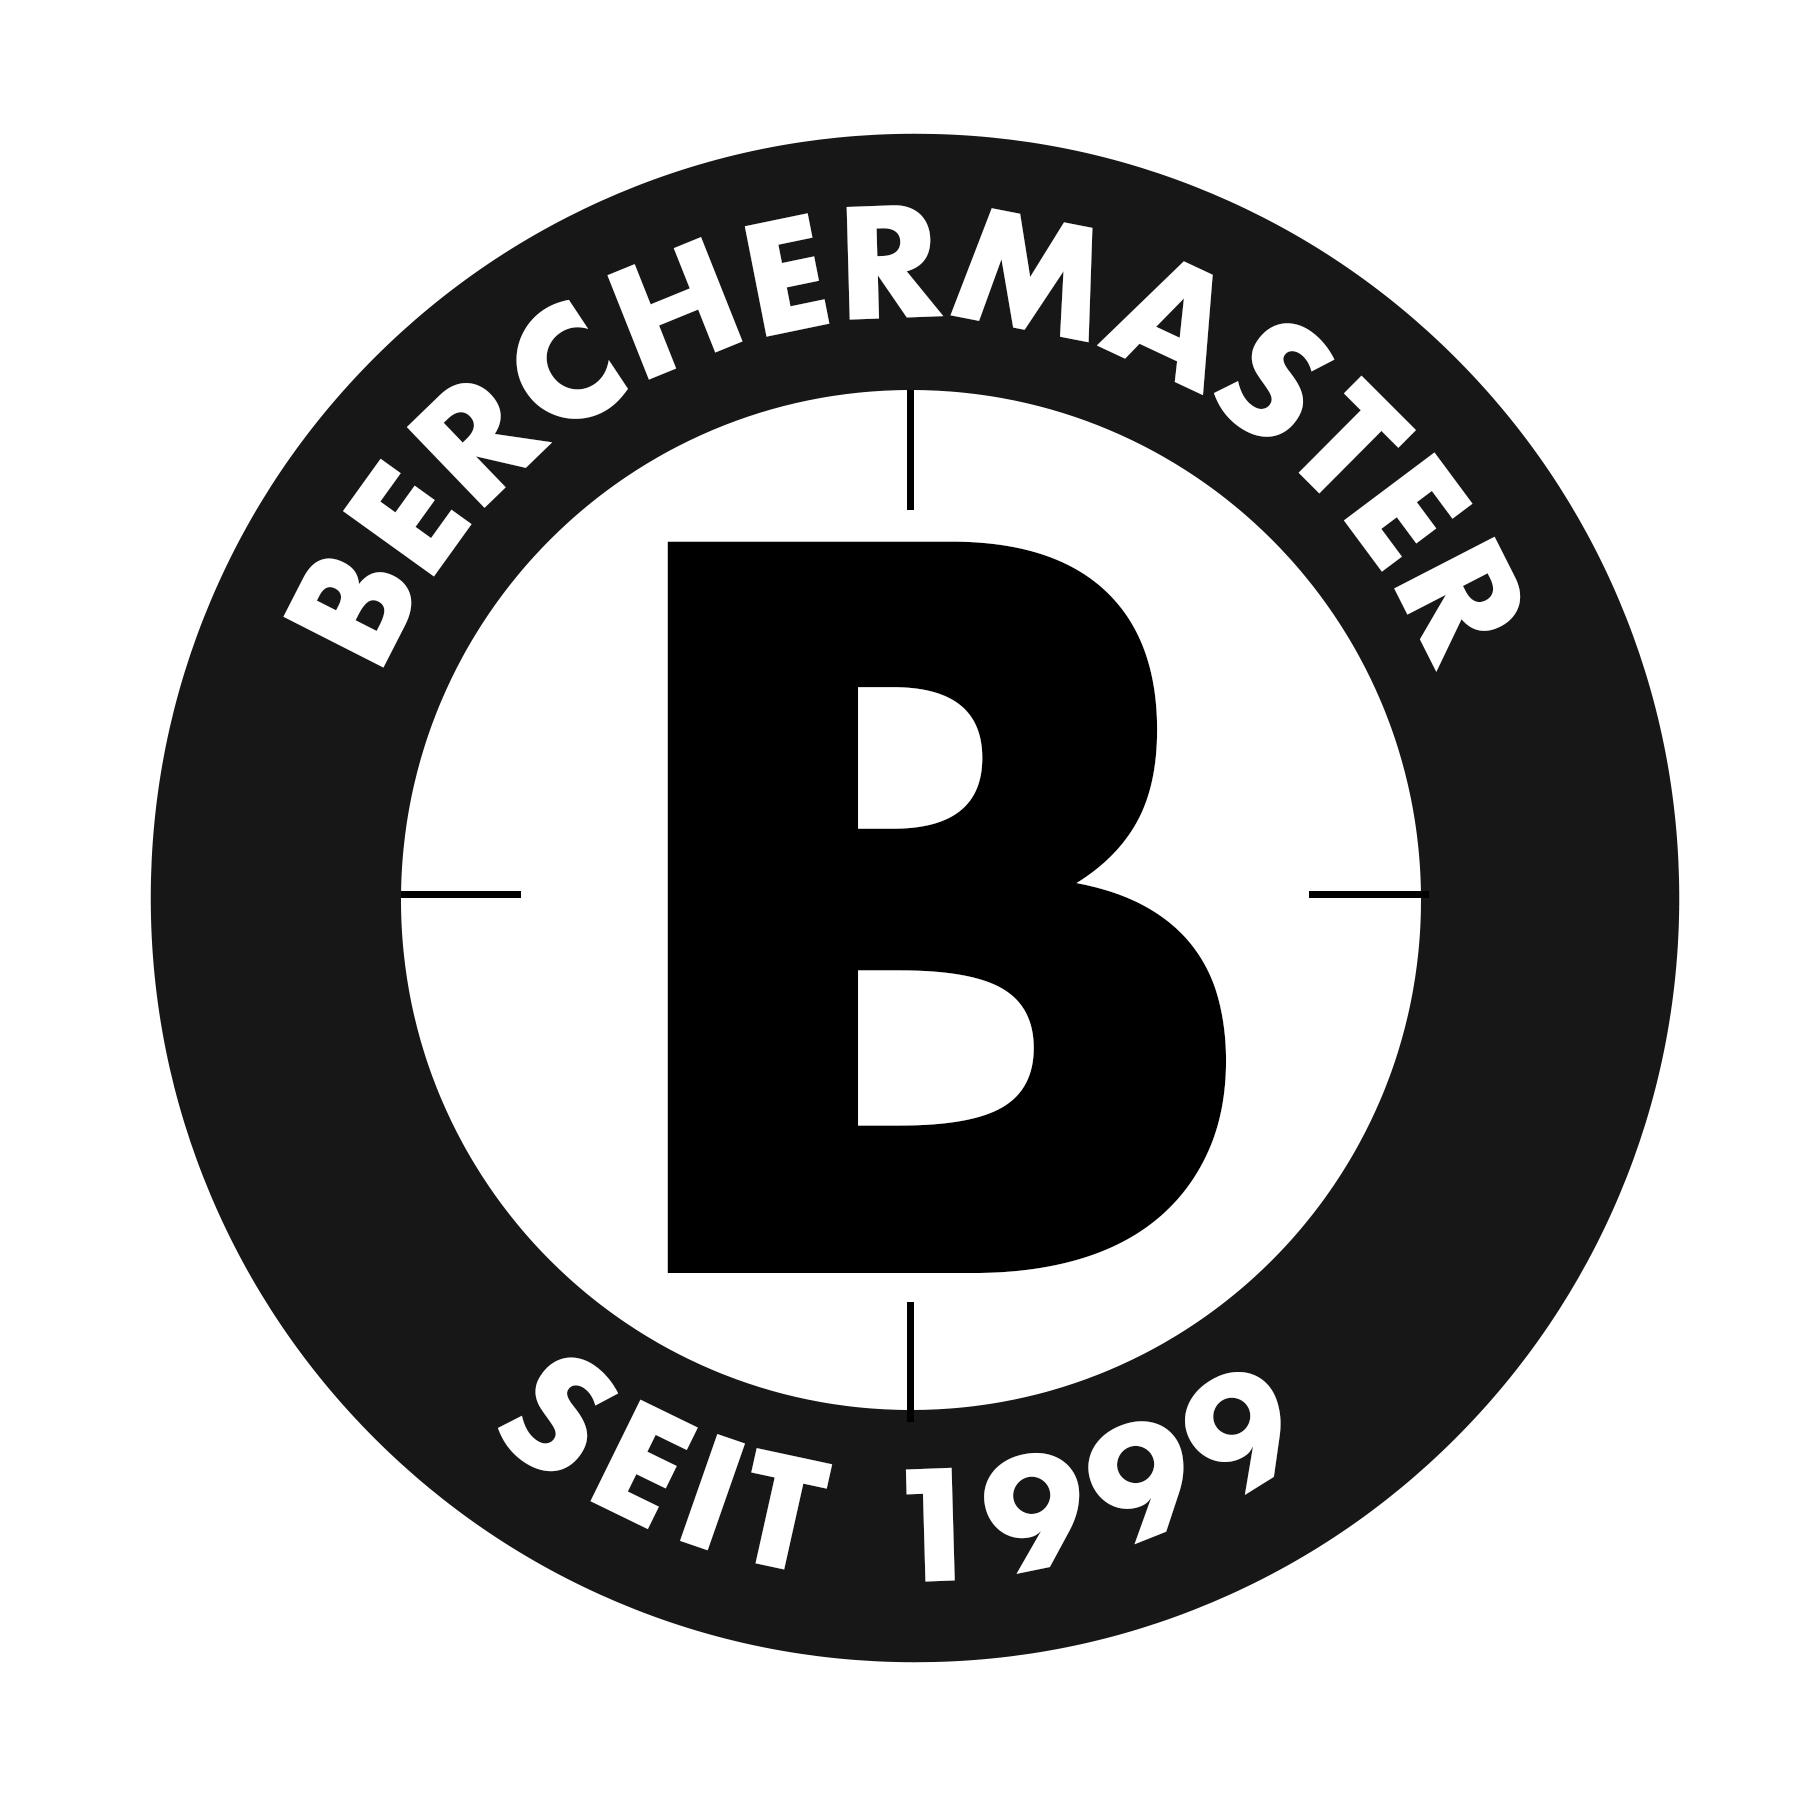 Logo Berchermaster